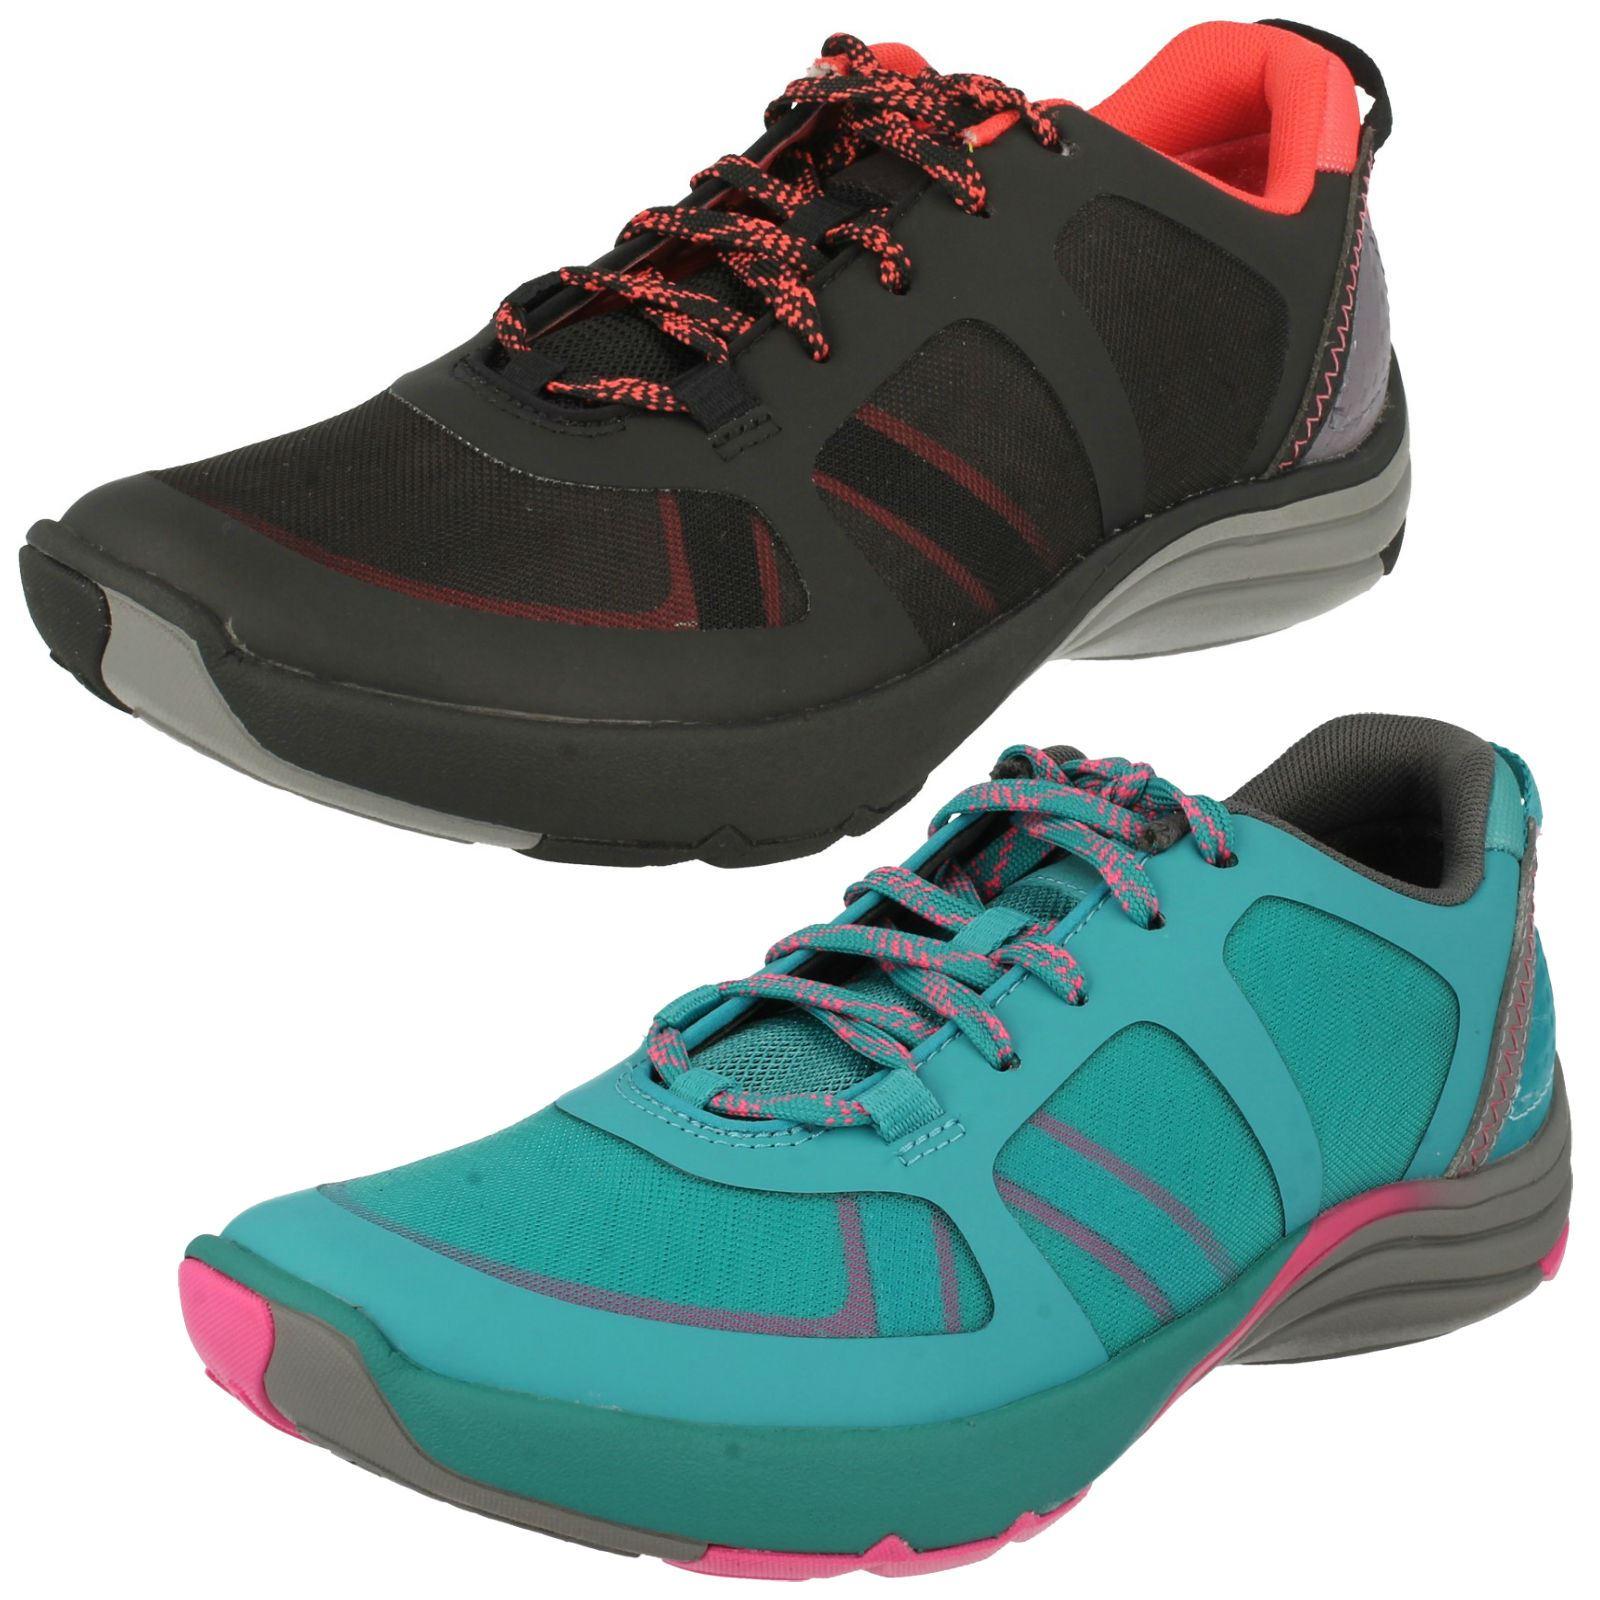 Ladies Clarks Active Wear Trainers Wave Kick